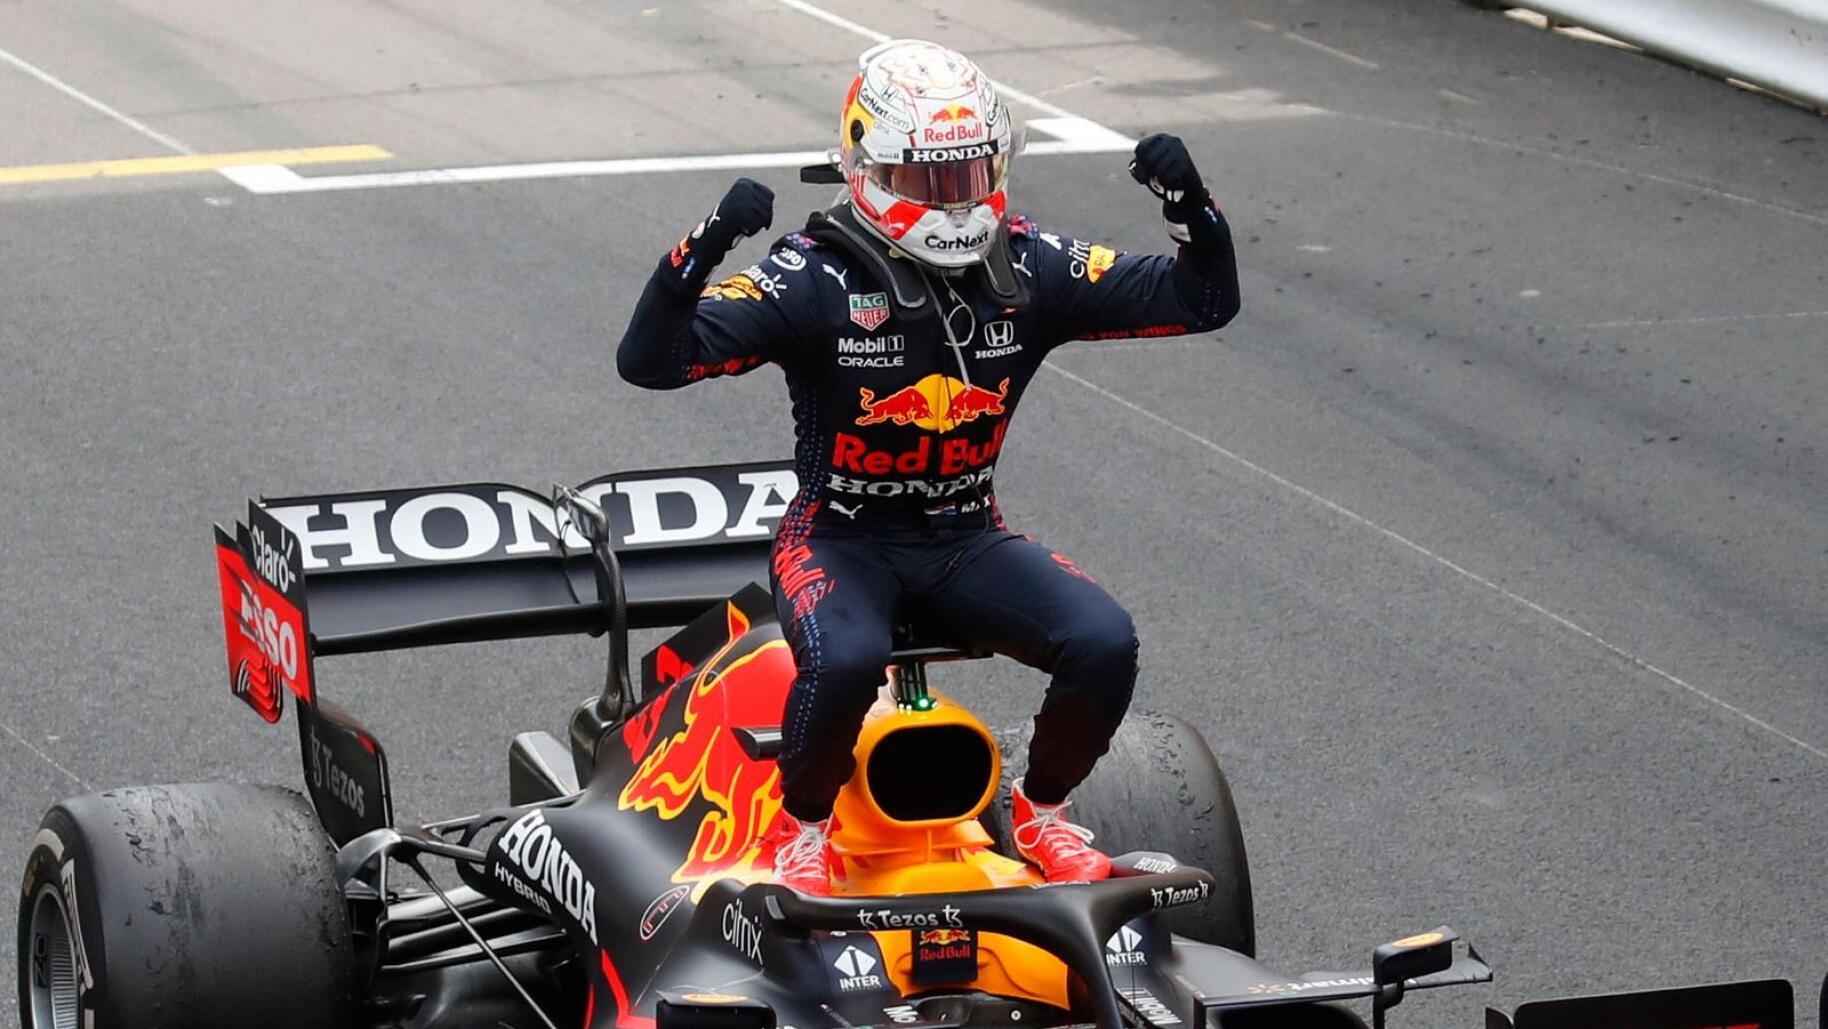 Red Bull's Max Verstappen celebrates after winning the Monaco Grand Prix